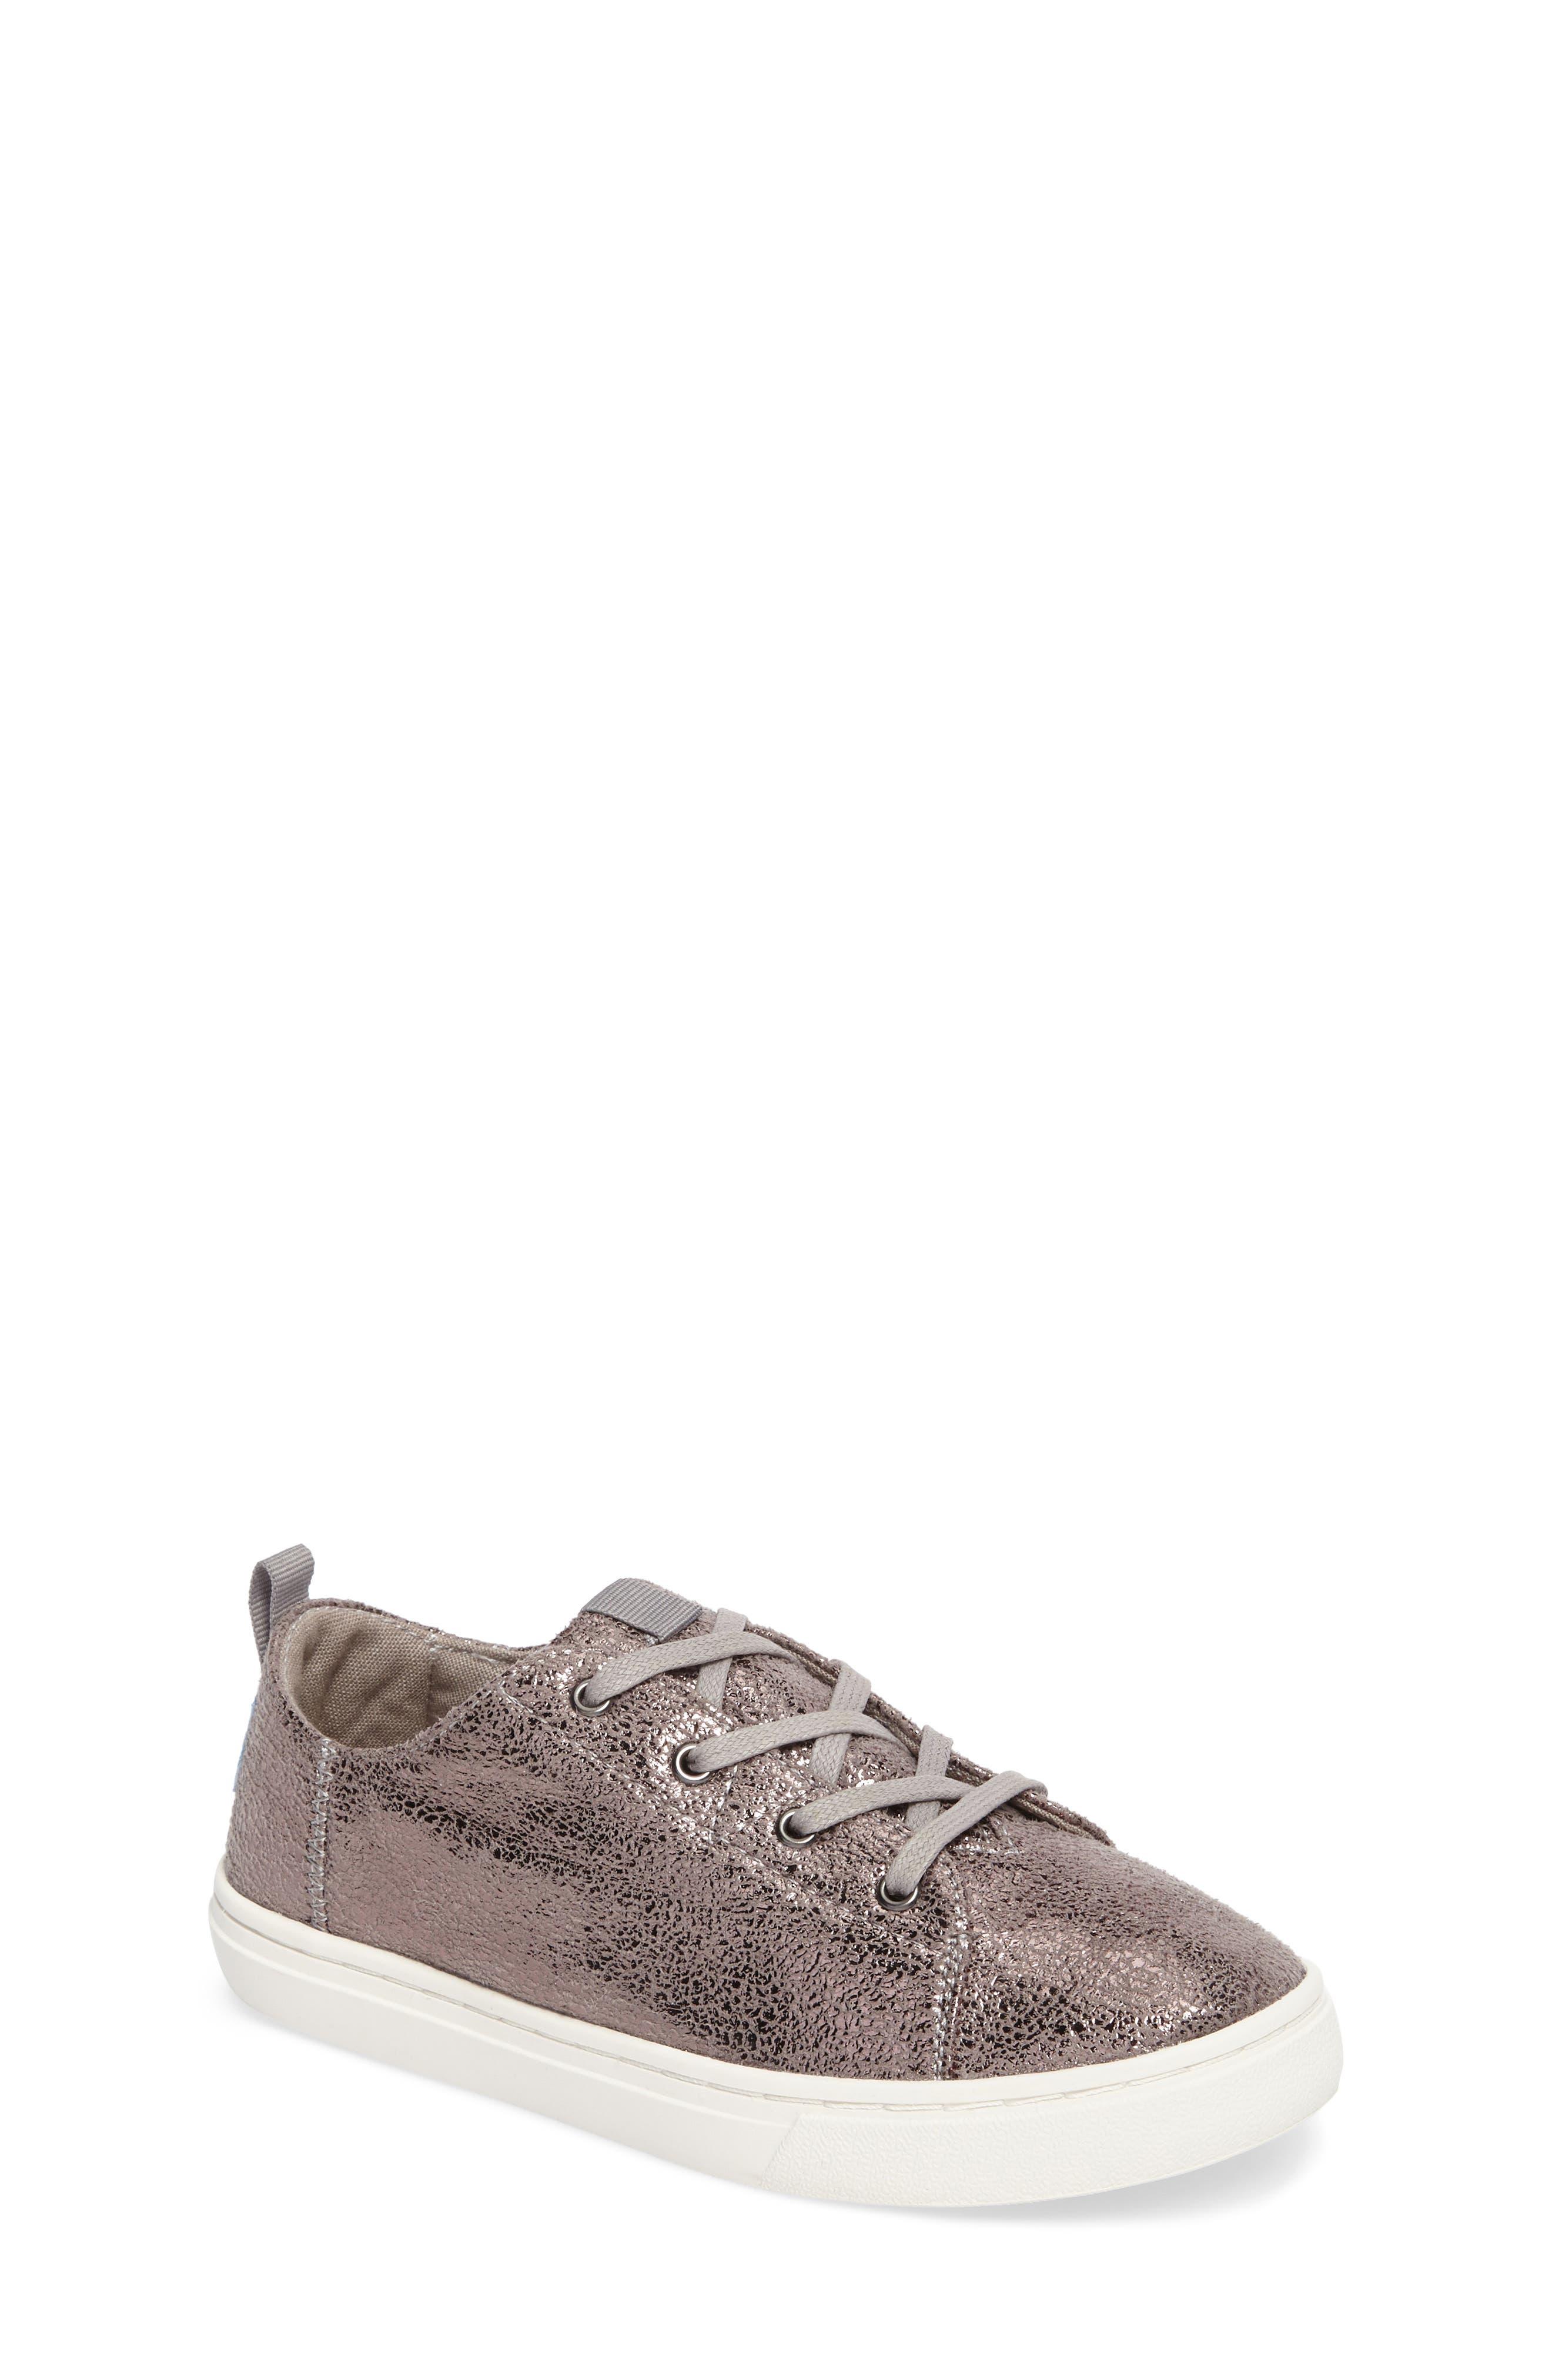 TOMS Lenny Sneaker, Main, color, 040